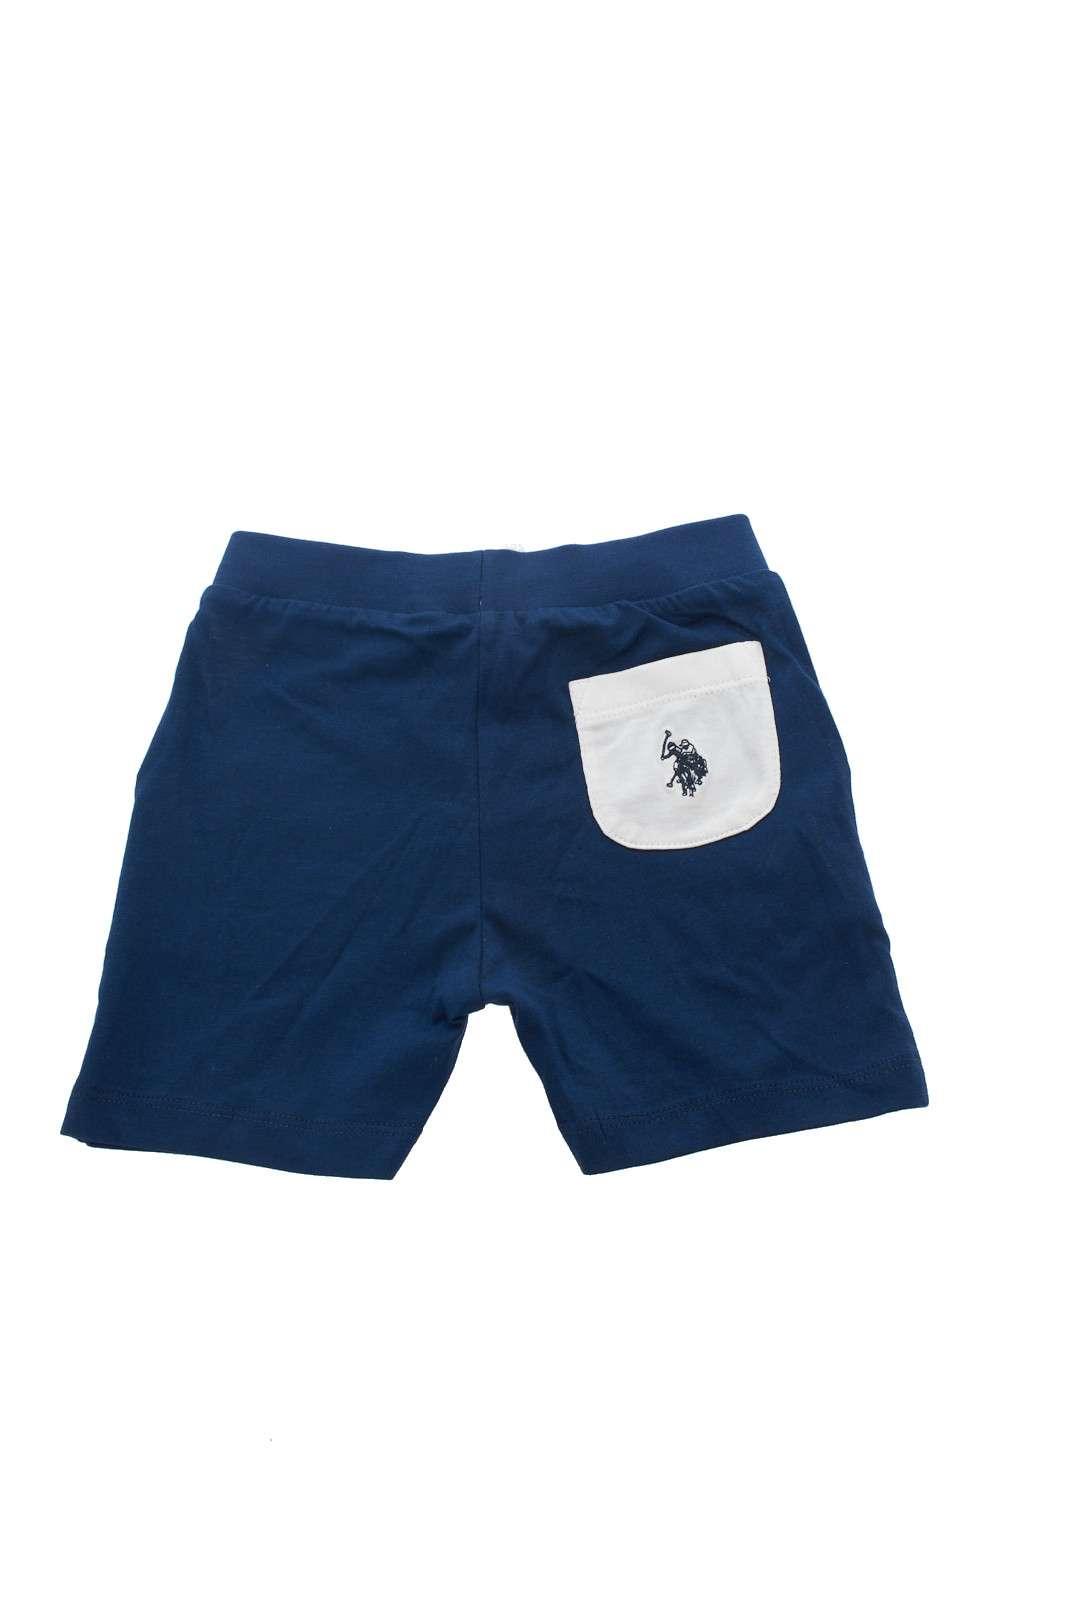 https://www.parmax.com/media/catalog/product/a/i/PE-outlet_parmax-pantaloncini-Bambino-Us-Polo-Assn-512074-B.jpg